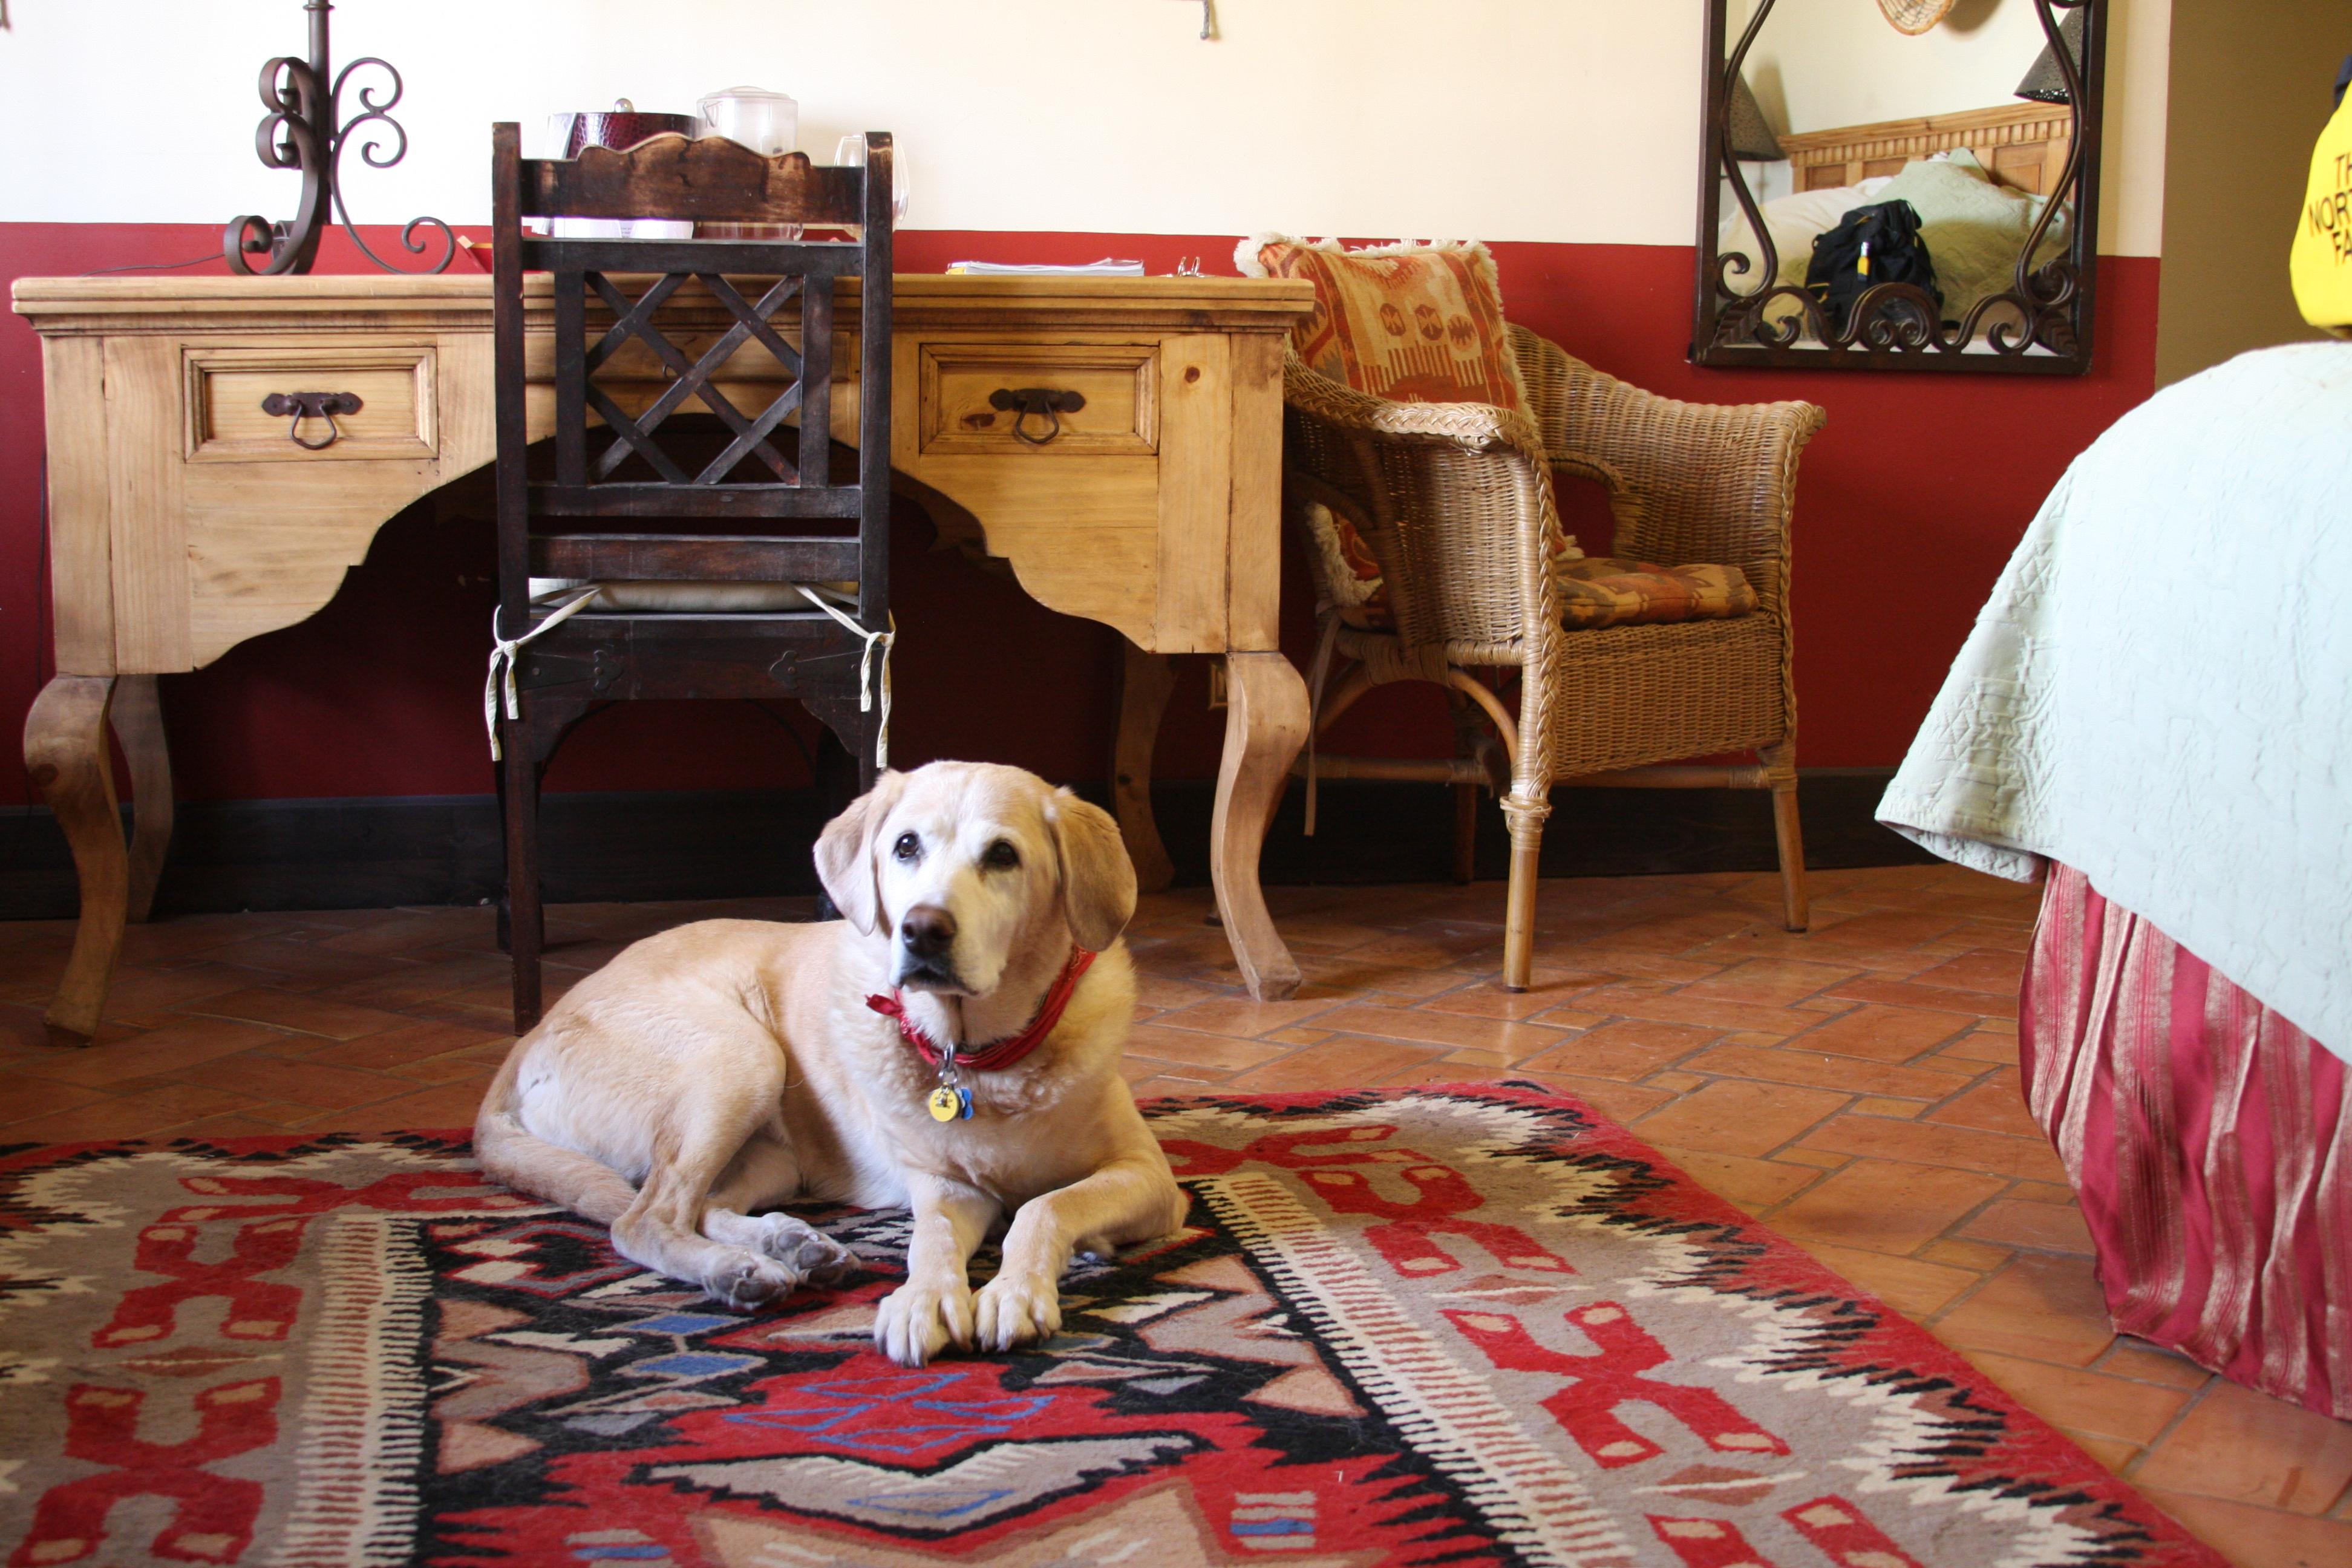 Faeden at La Posada Hotel, Winslow, AZ